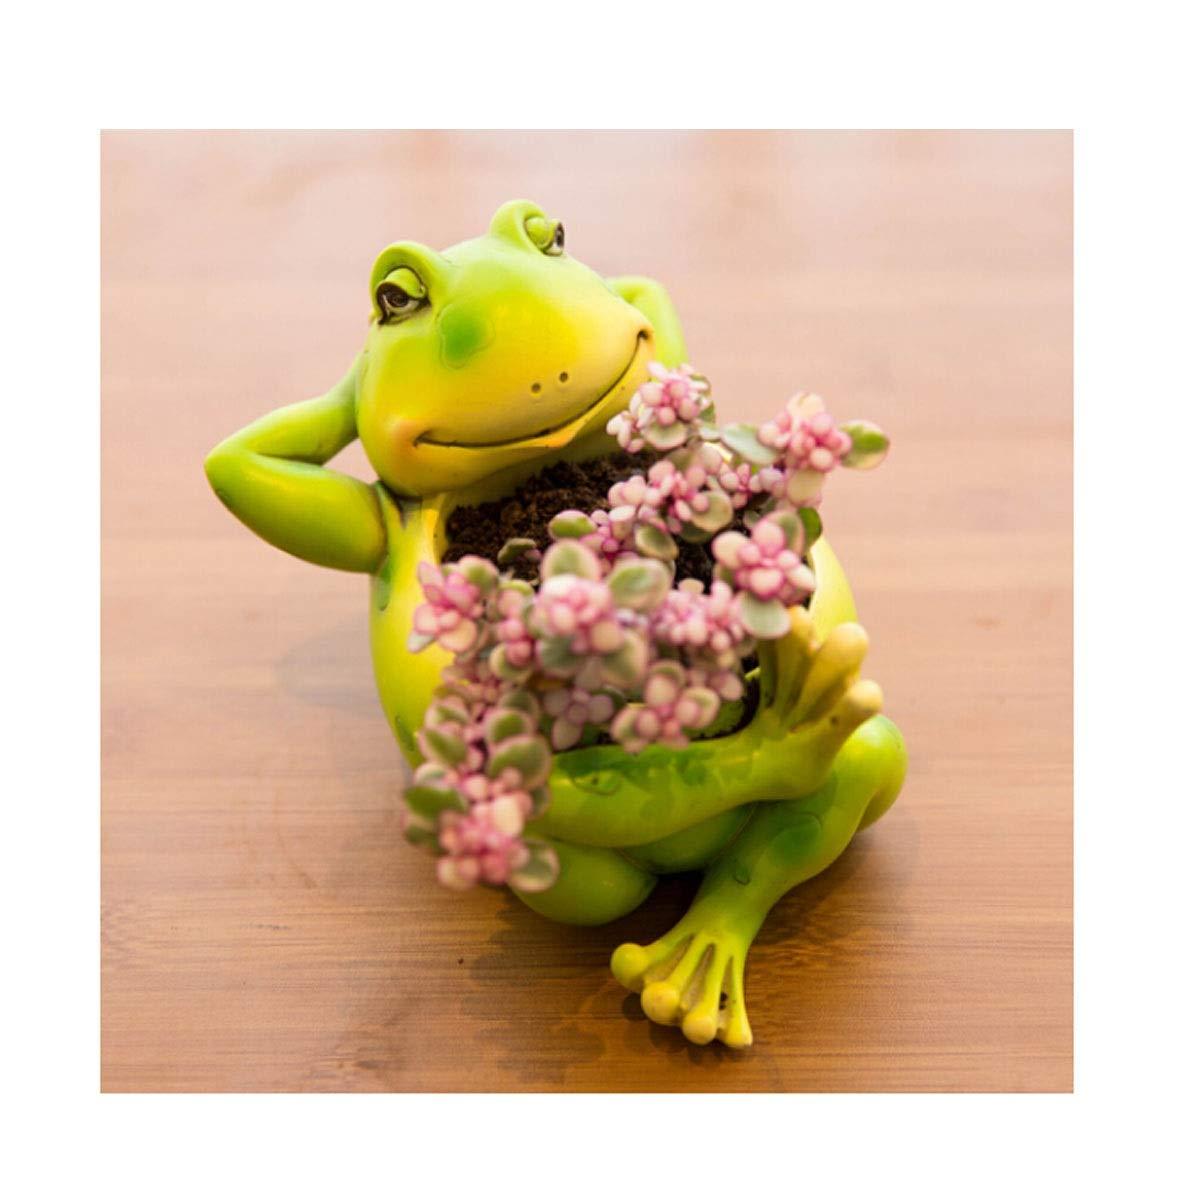 HUIJUNWENTI Flower Pot, Resin Cartoon Animal Ornaments, Creative Plant Flower Pot, Owl Flower Pot (Color : S) by HUIJUNWENTI